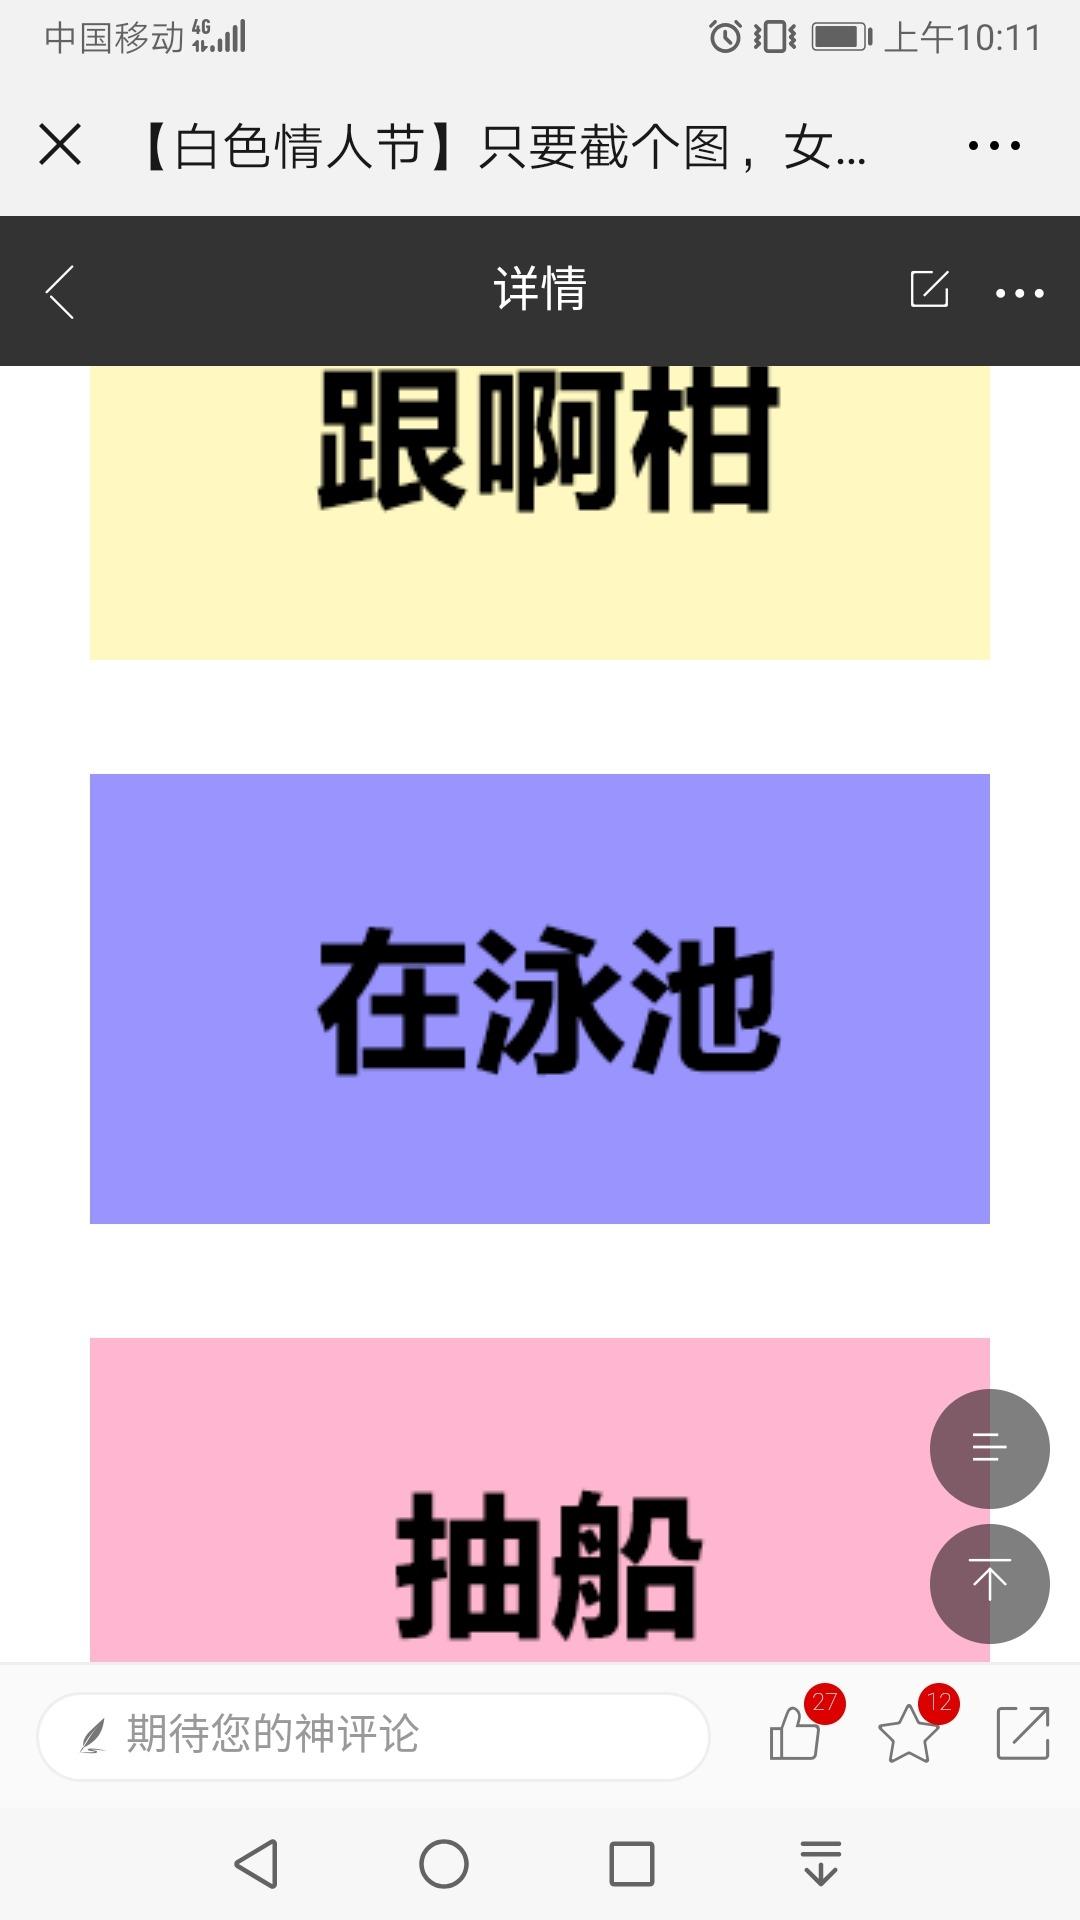 Screenshot_20190314_101130_com.tencent.mm.jpg